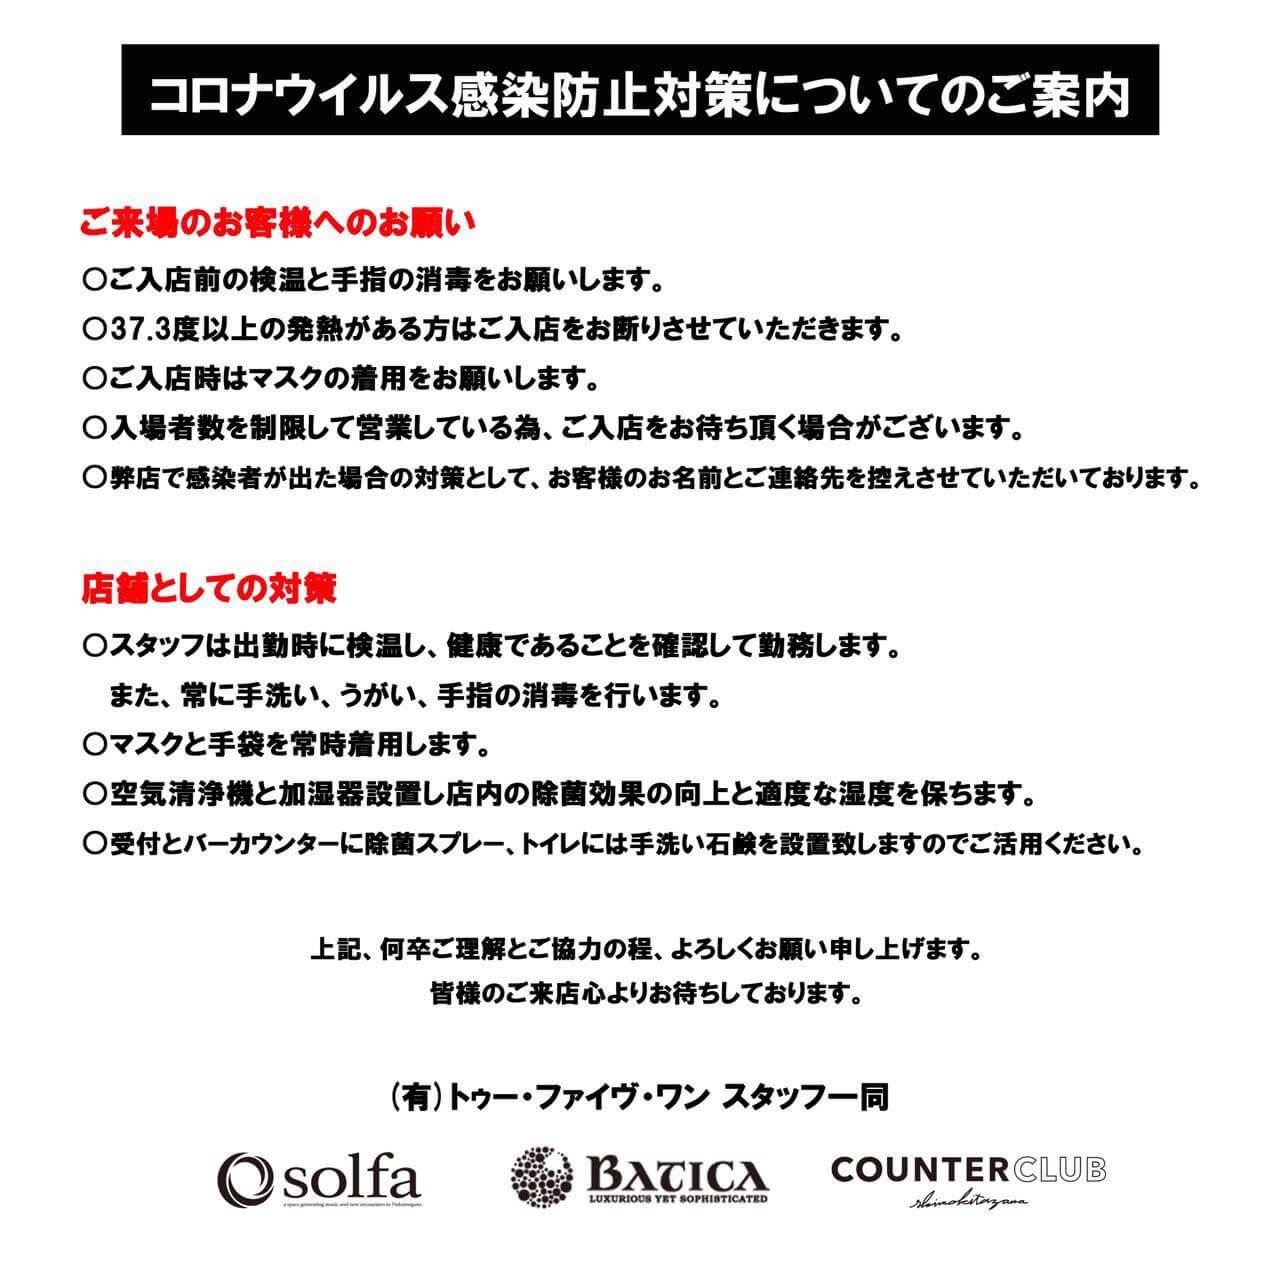 OK CLAN、LSBOYZ、JUMANJI、MFSらが登場する配信イベントが12月18日に中目黒solfaで開催 music201215-okusanight-2